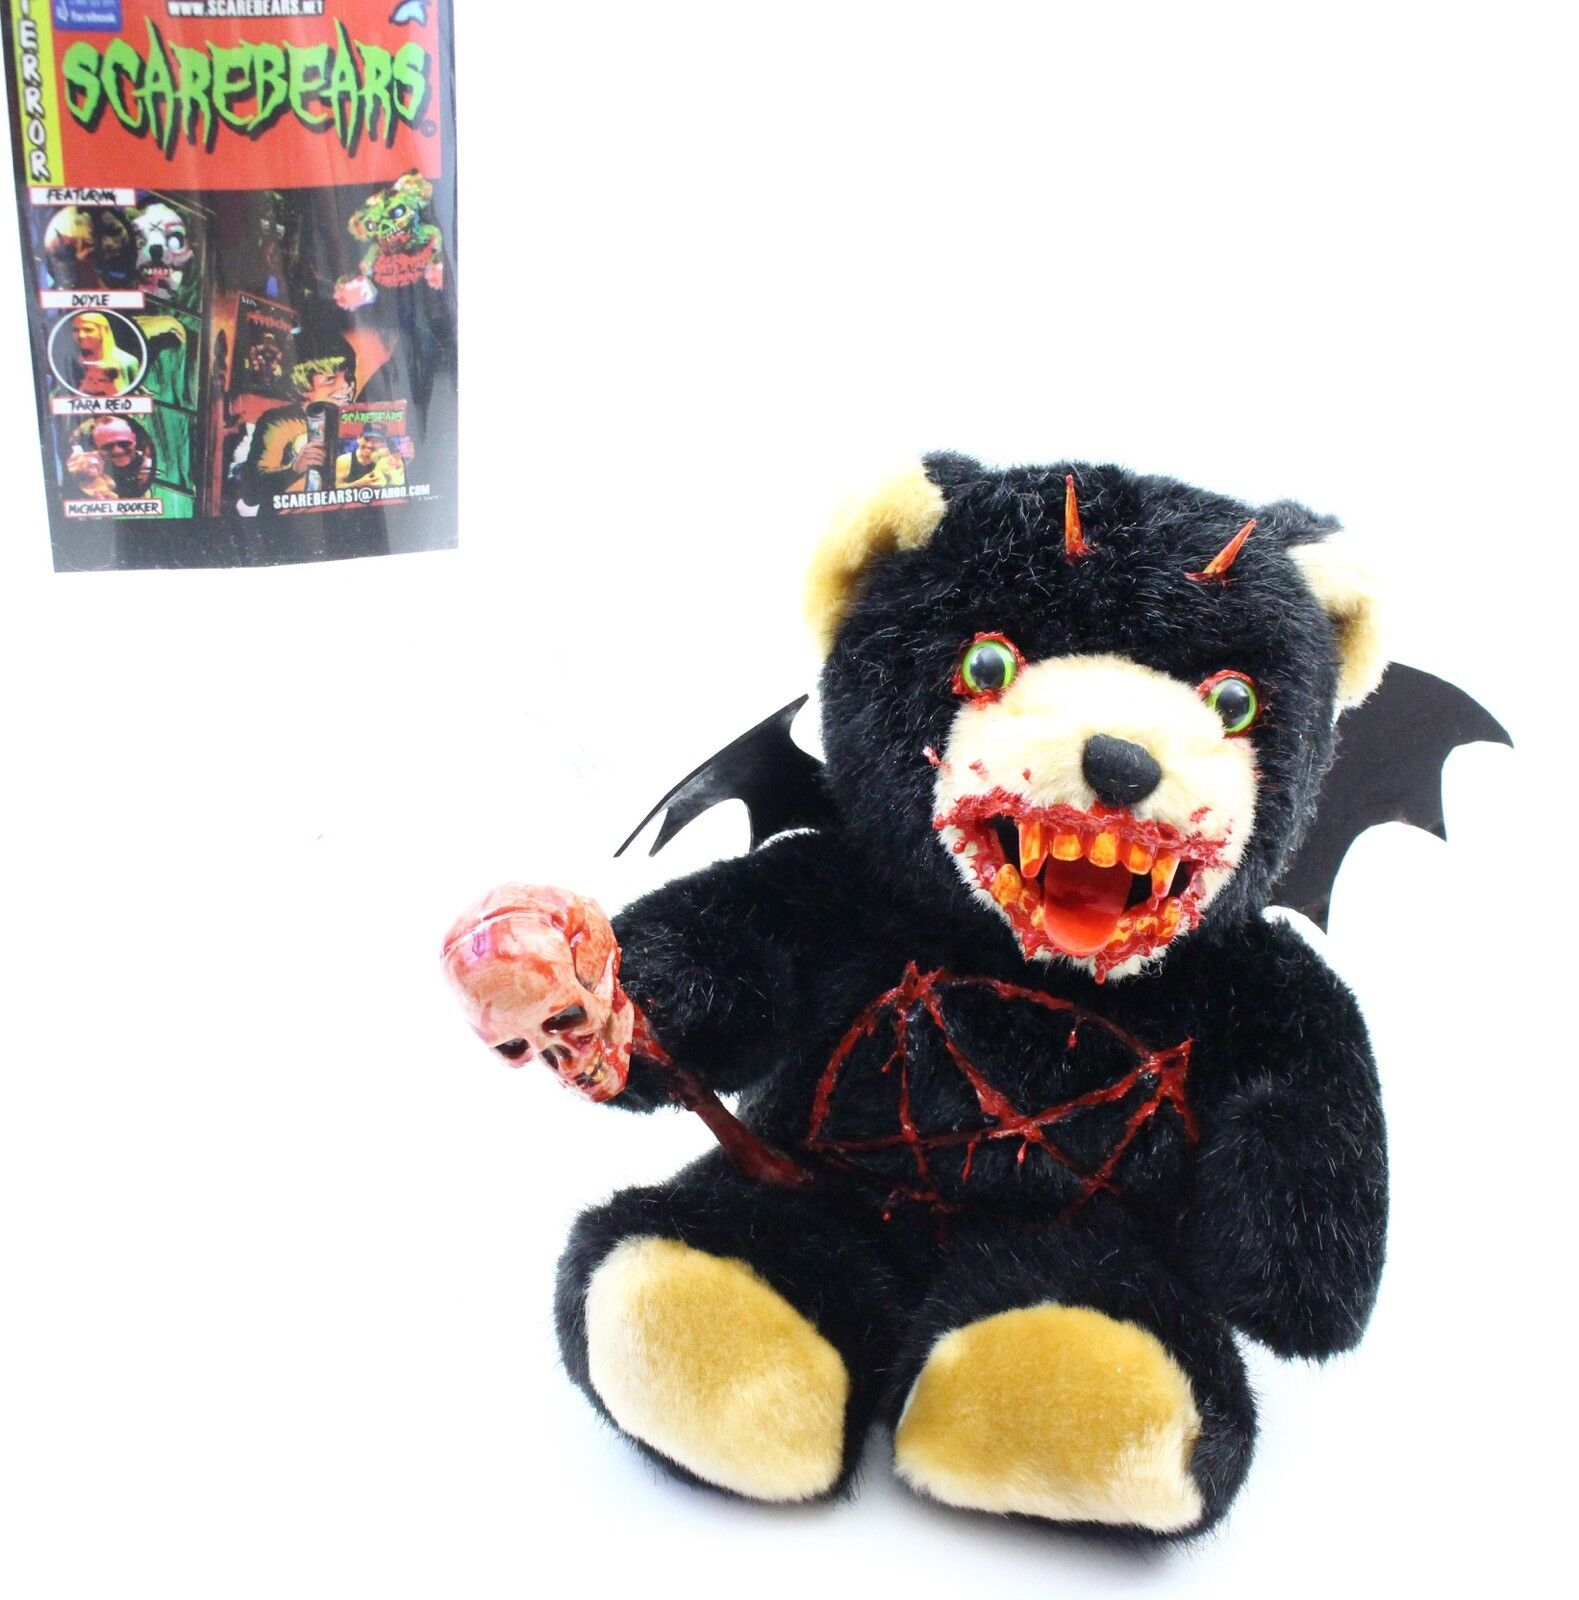 Original, Early Scarebears negro Bear Pentagram, Skull Horror Autographed